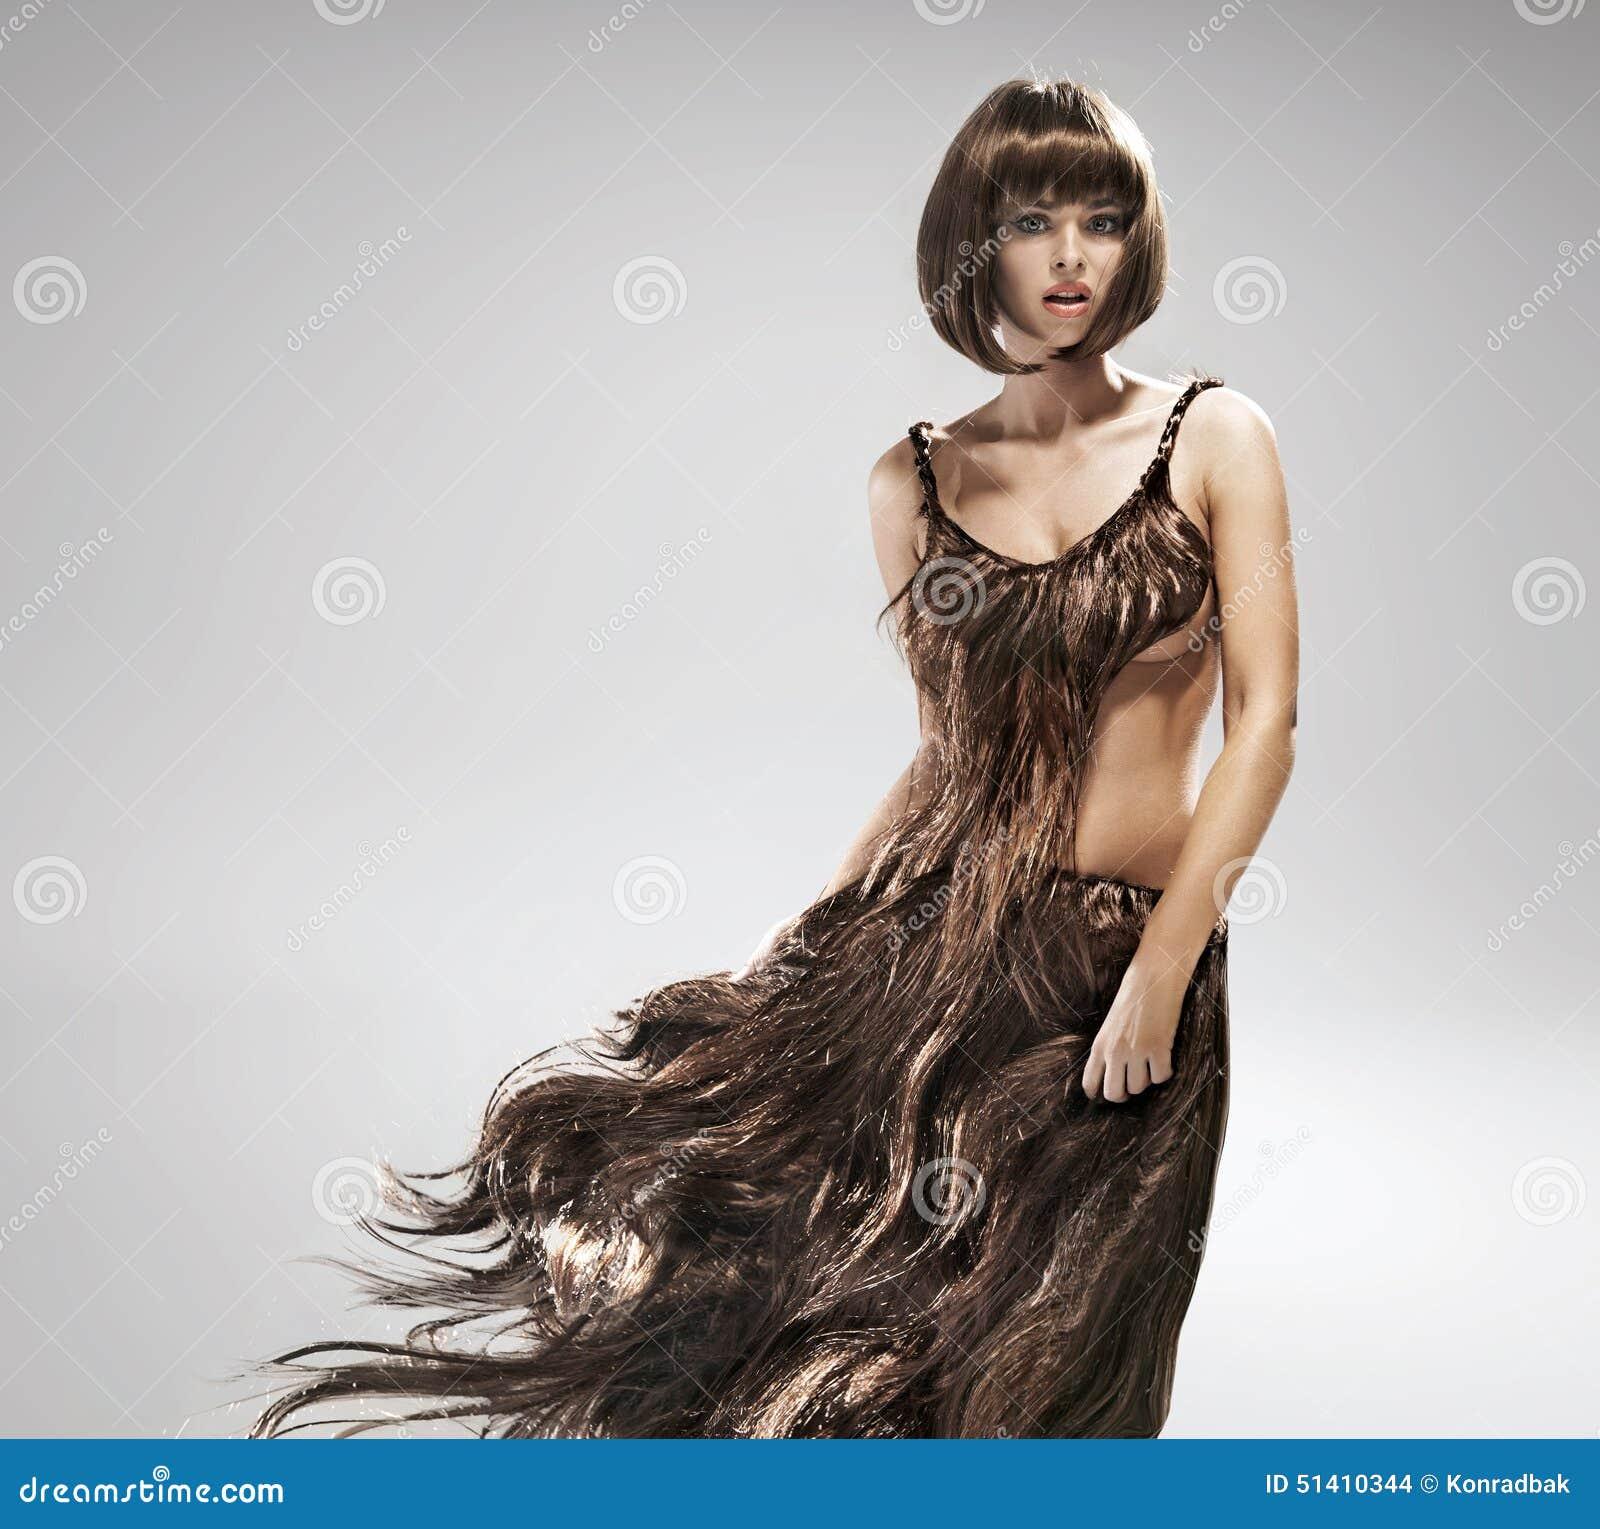 Original Hair Dress Hmm